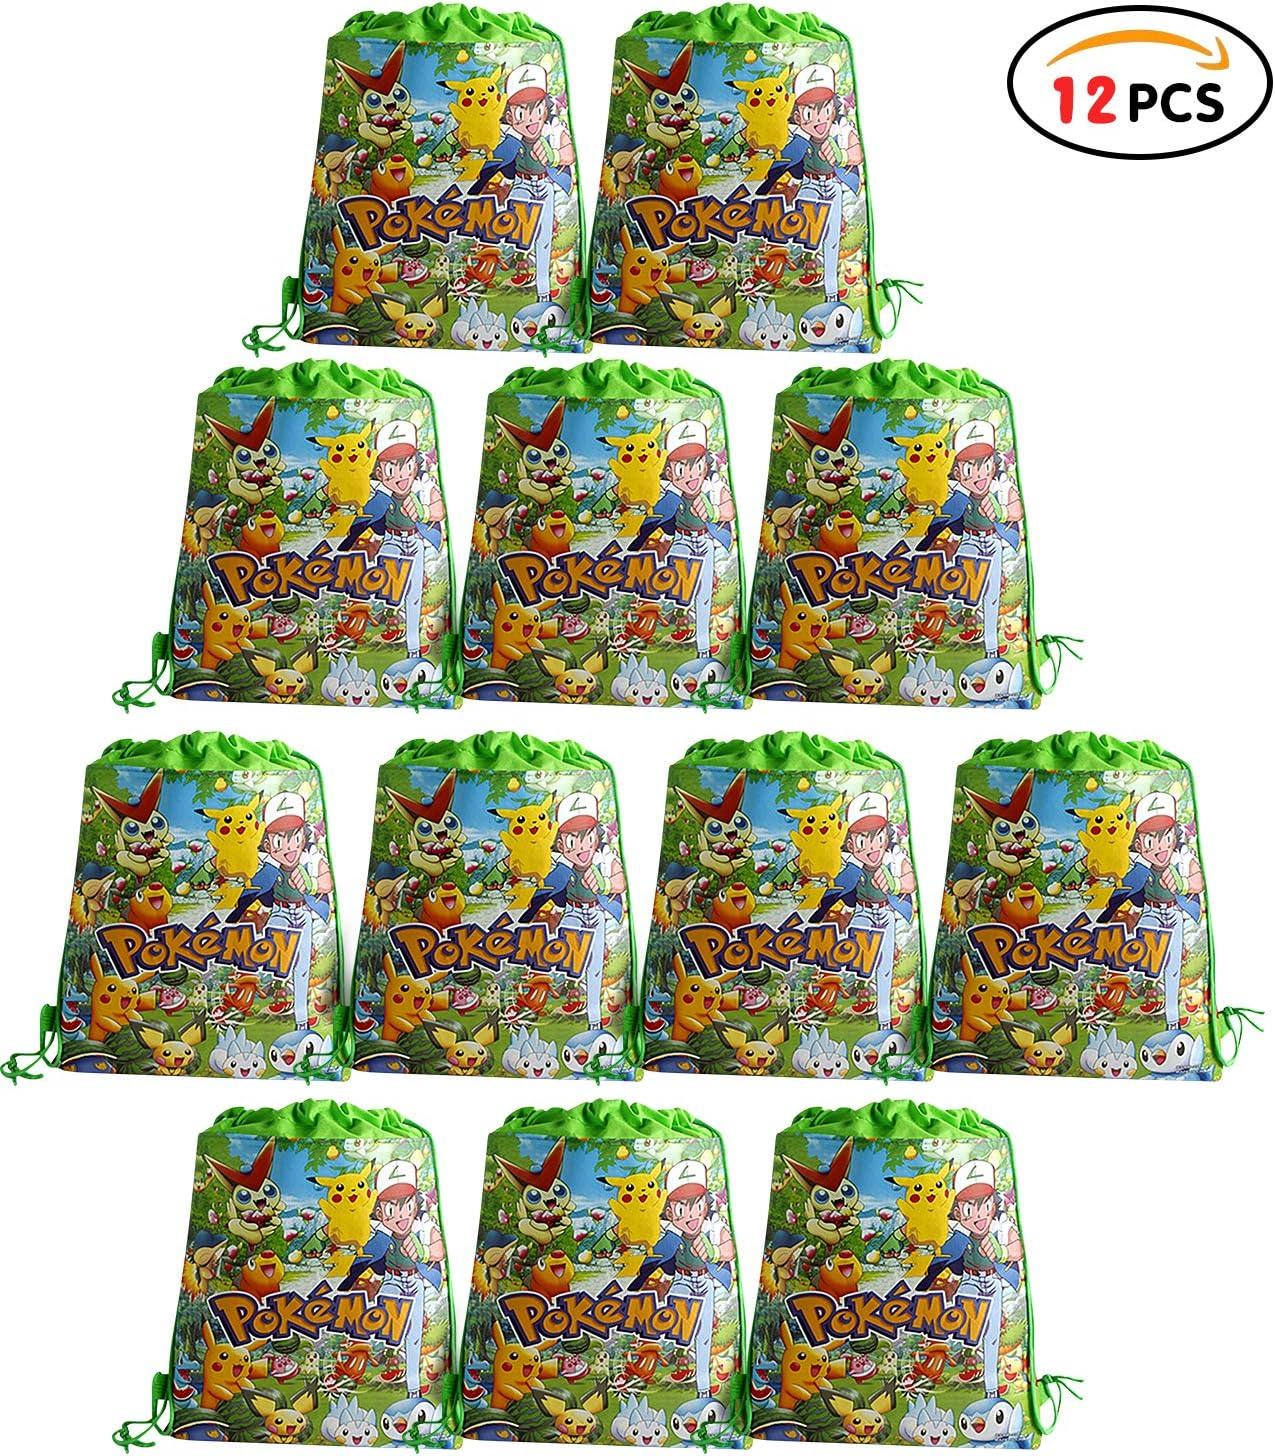 Qemsele Bolsa Mochilas Bolsas de cumpleañoscordón Dibujos Animados Mochila Bolsas para cumpleaños niños y Adultos la Fiesta favorece la Bolsa, Rellenos Bolsas Fiesta 12Pcs (Pokemon, W10 * H12)